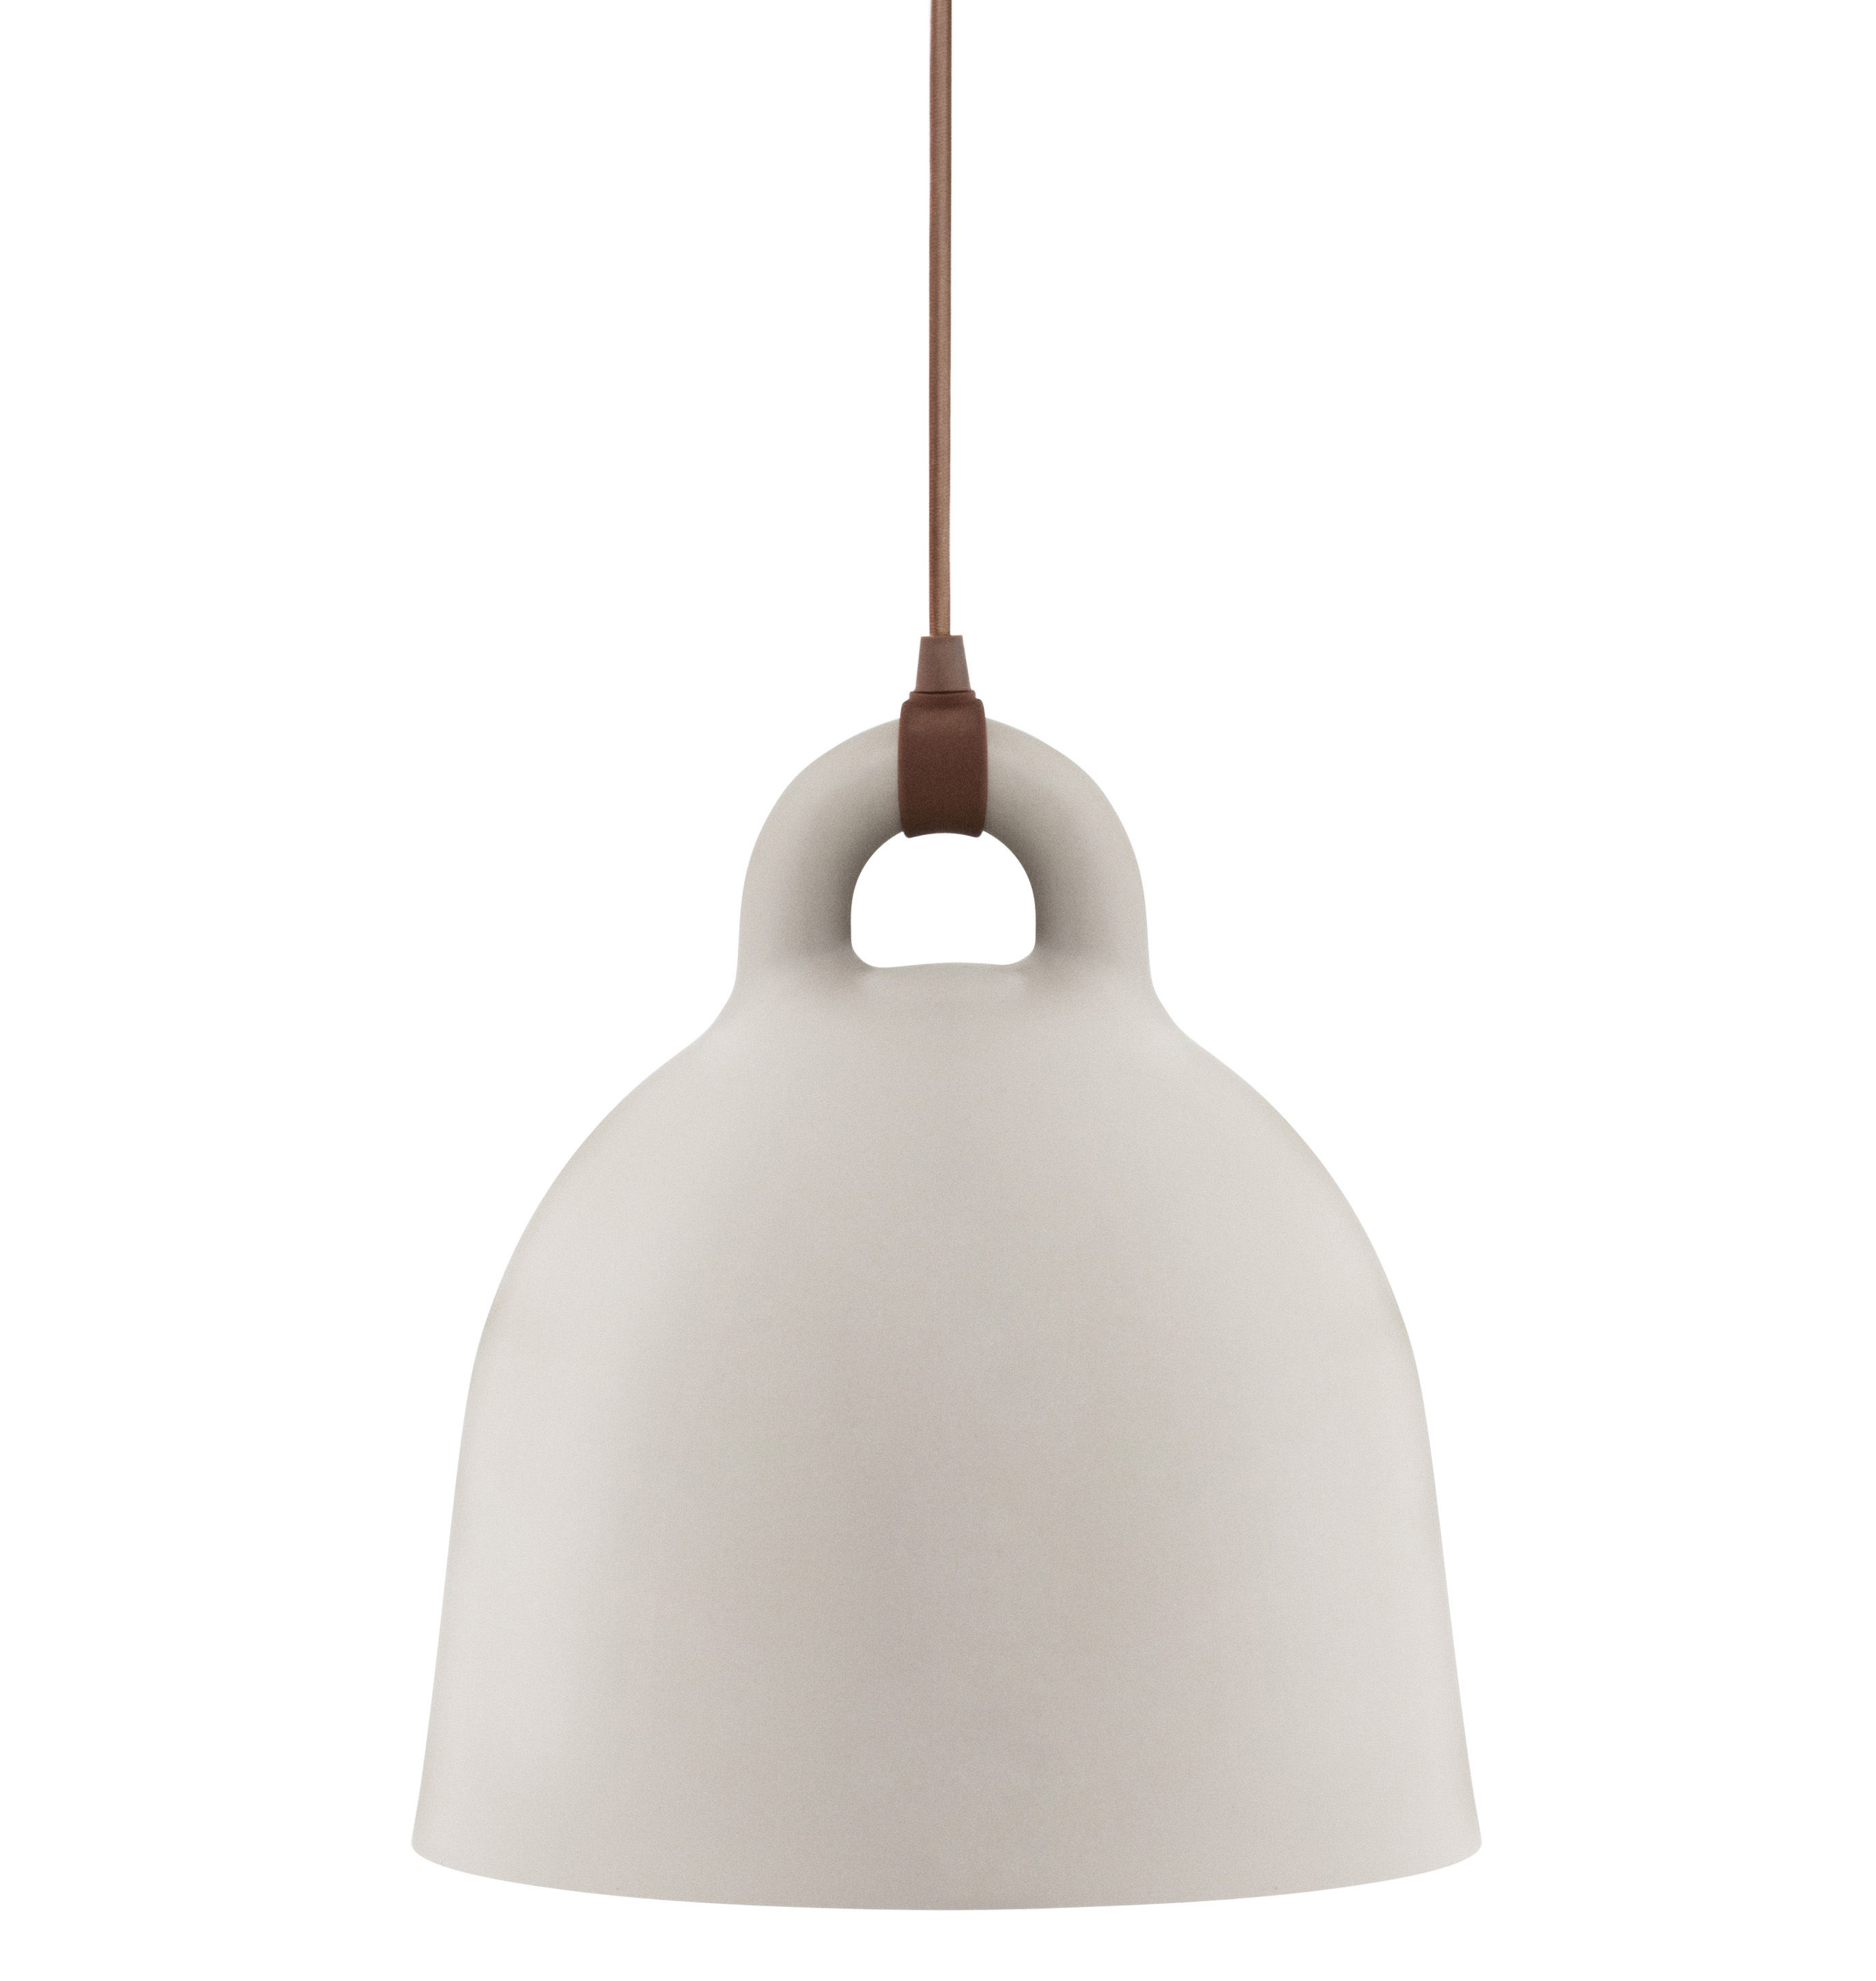 Luminaire - Suspensions - Suspension Bell / Small Ø 35 cm - Normann Copenhagen - Sable mat & Int. Blanc - Aluminium